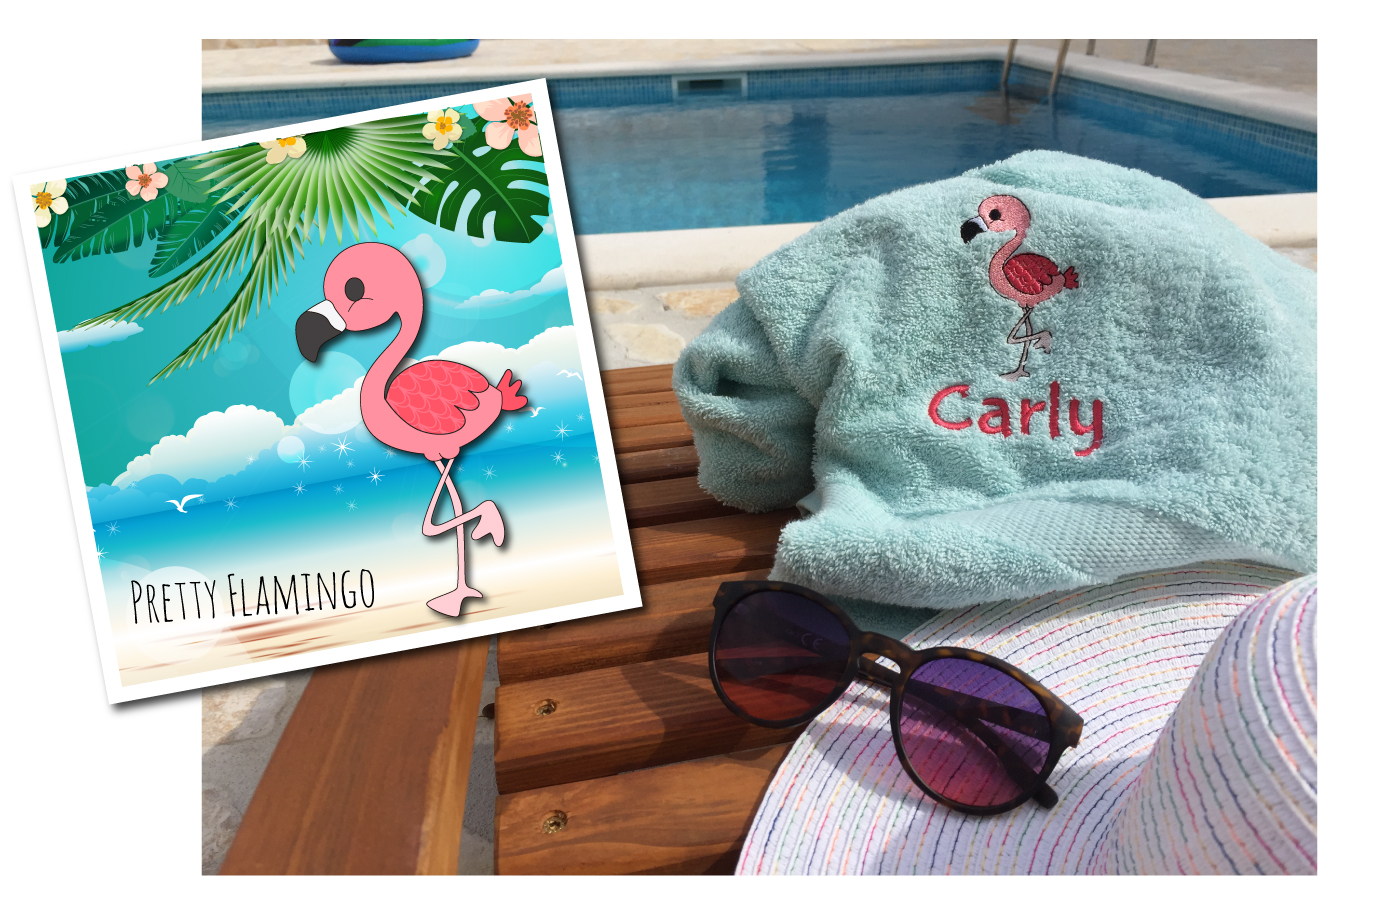 Kraamcadeau met Flamingo